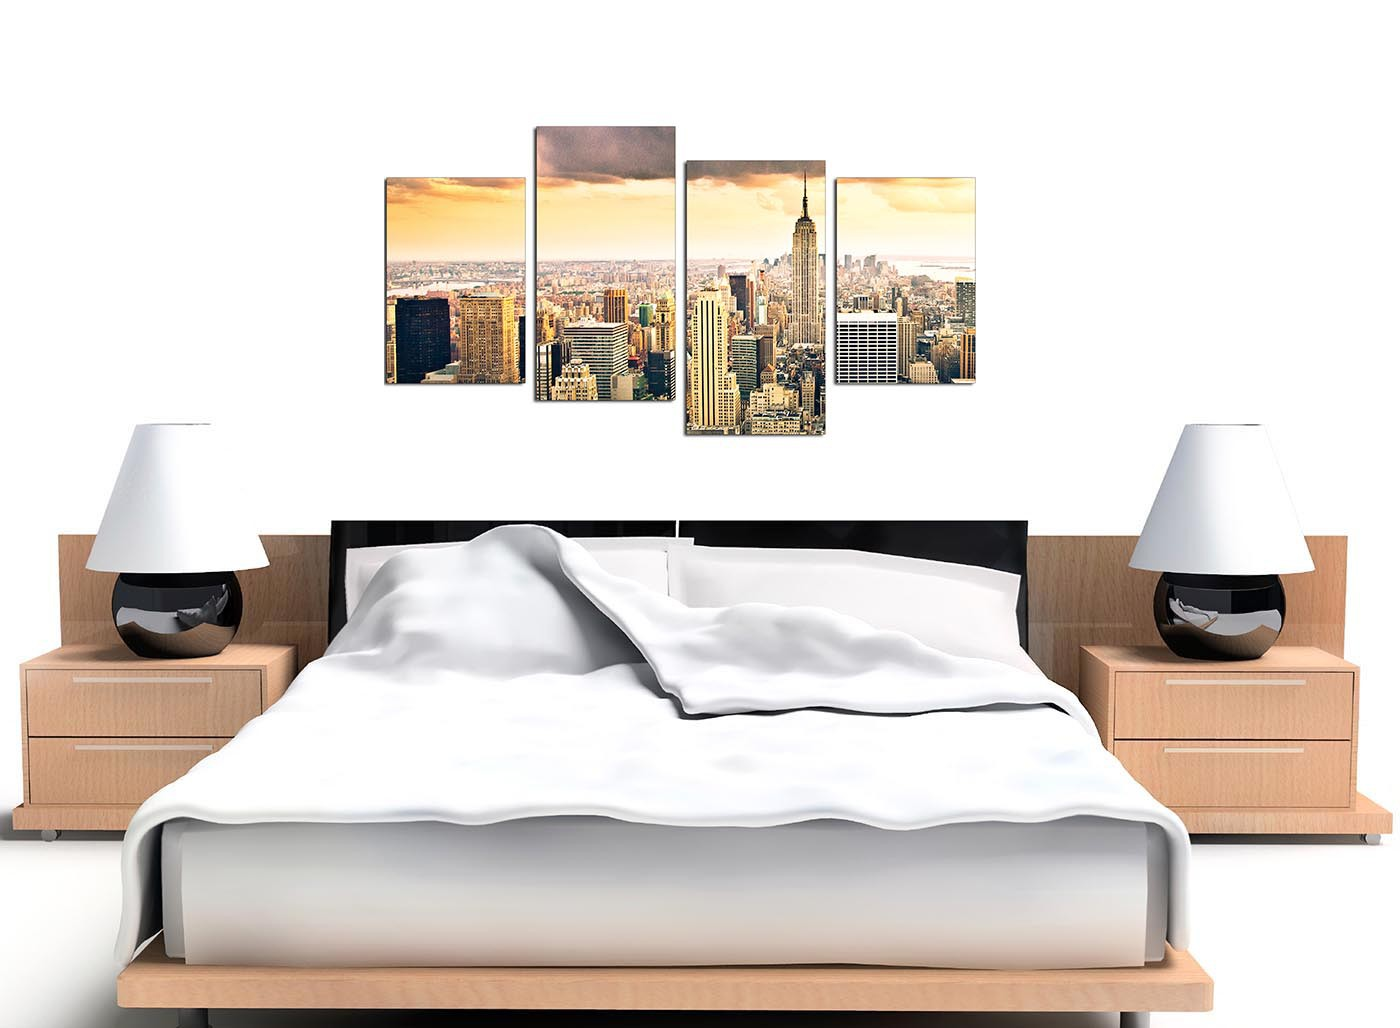 New York Skyline Wallpaper For Bedroom Canvas Art Of The New York Skyline For Your Bedroom Set Of 4